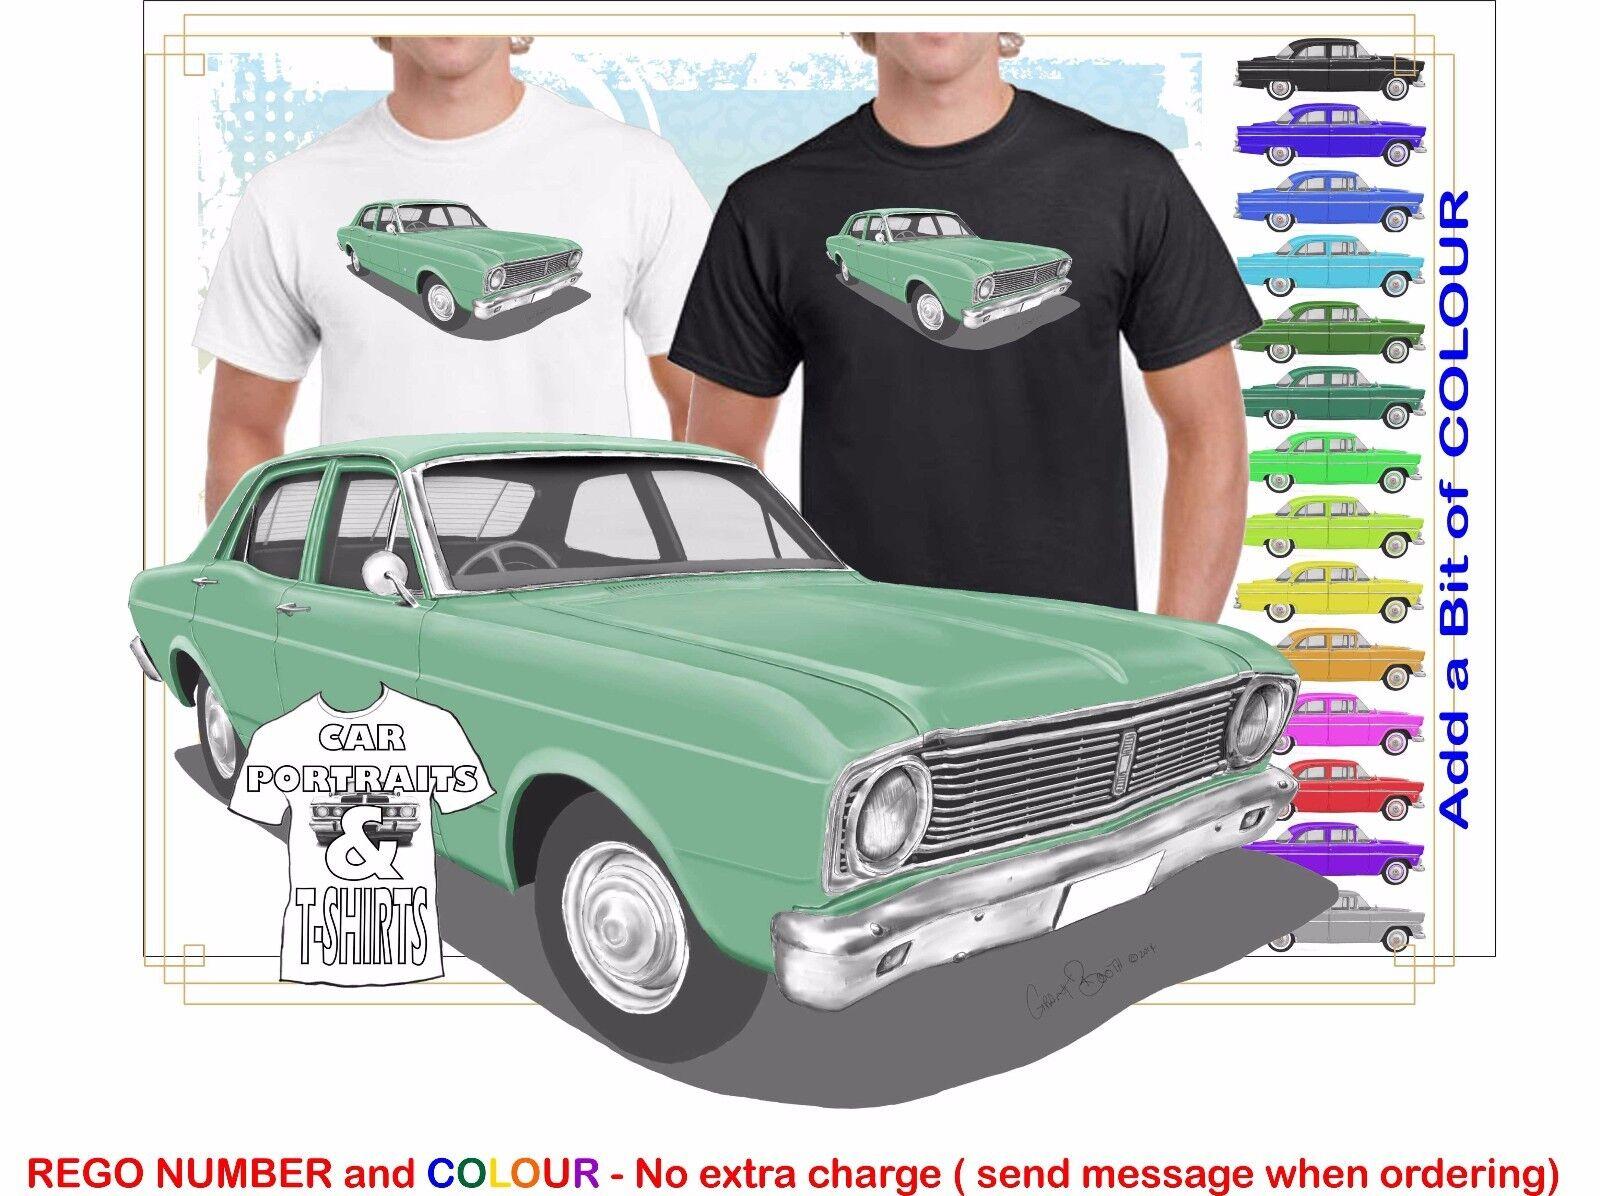 CLASSIC 1968-69 XT FALCON SEDAN ILLUSTRATED T-SHIRT MUSCLE RETRO SPORT CAR